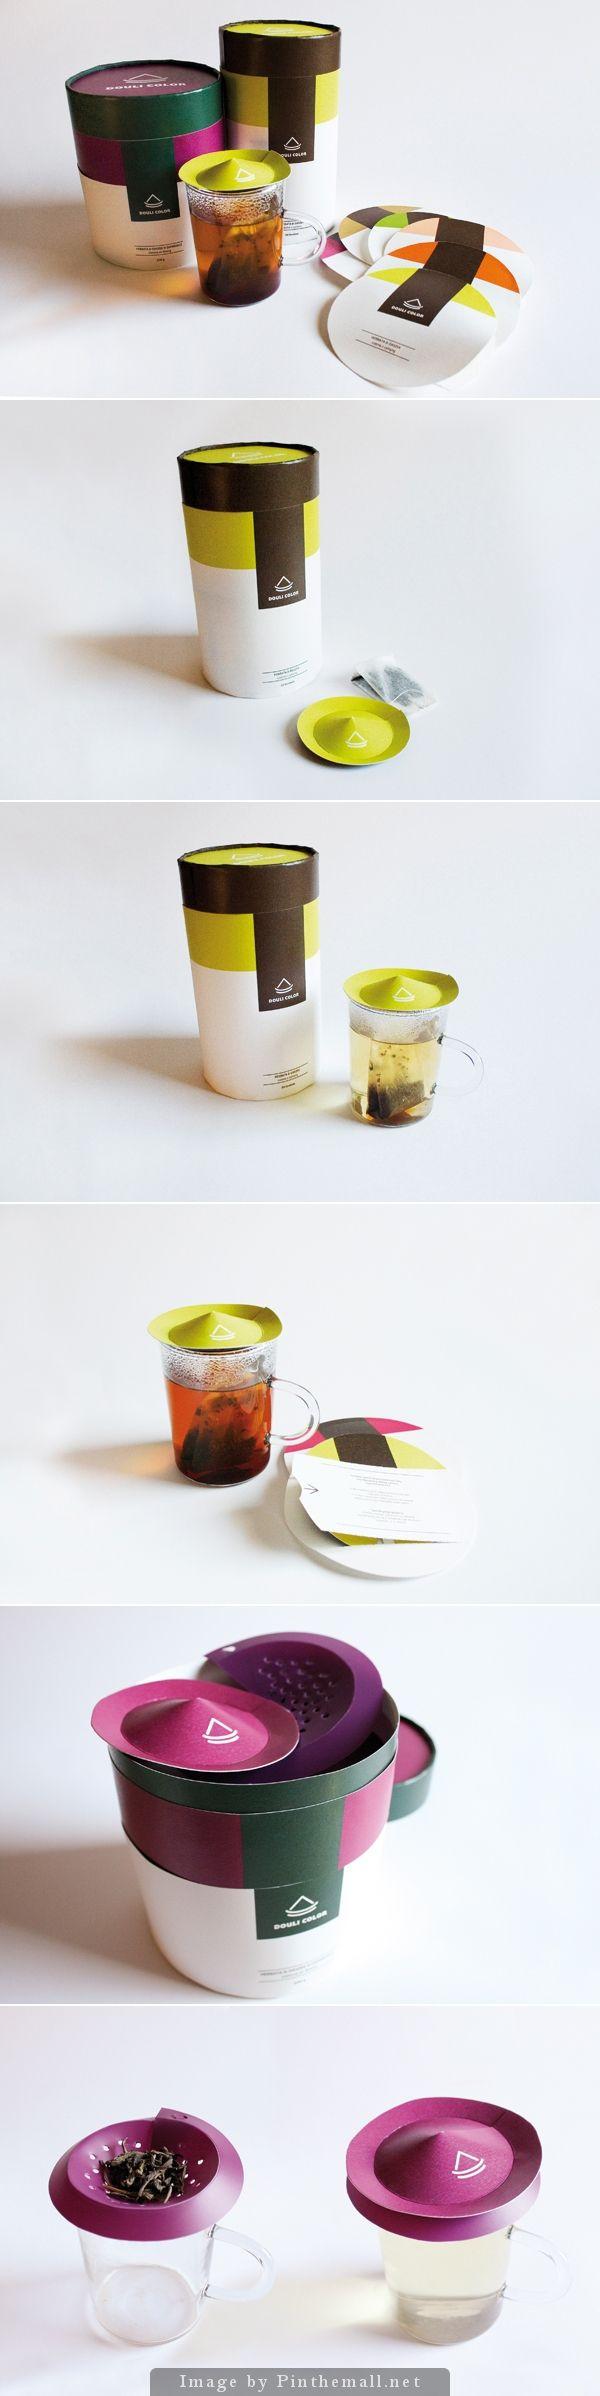 Douli Color Tea Packaging